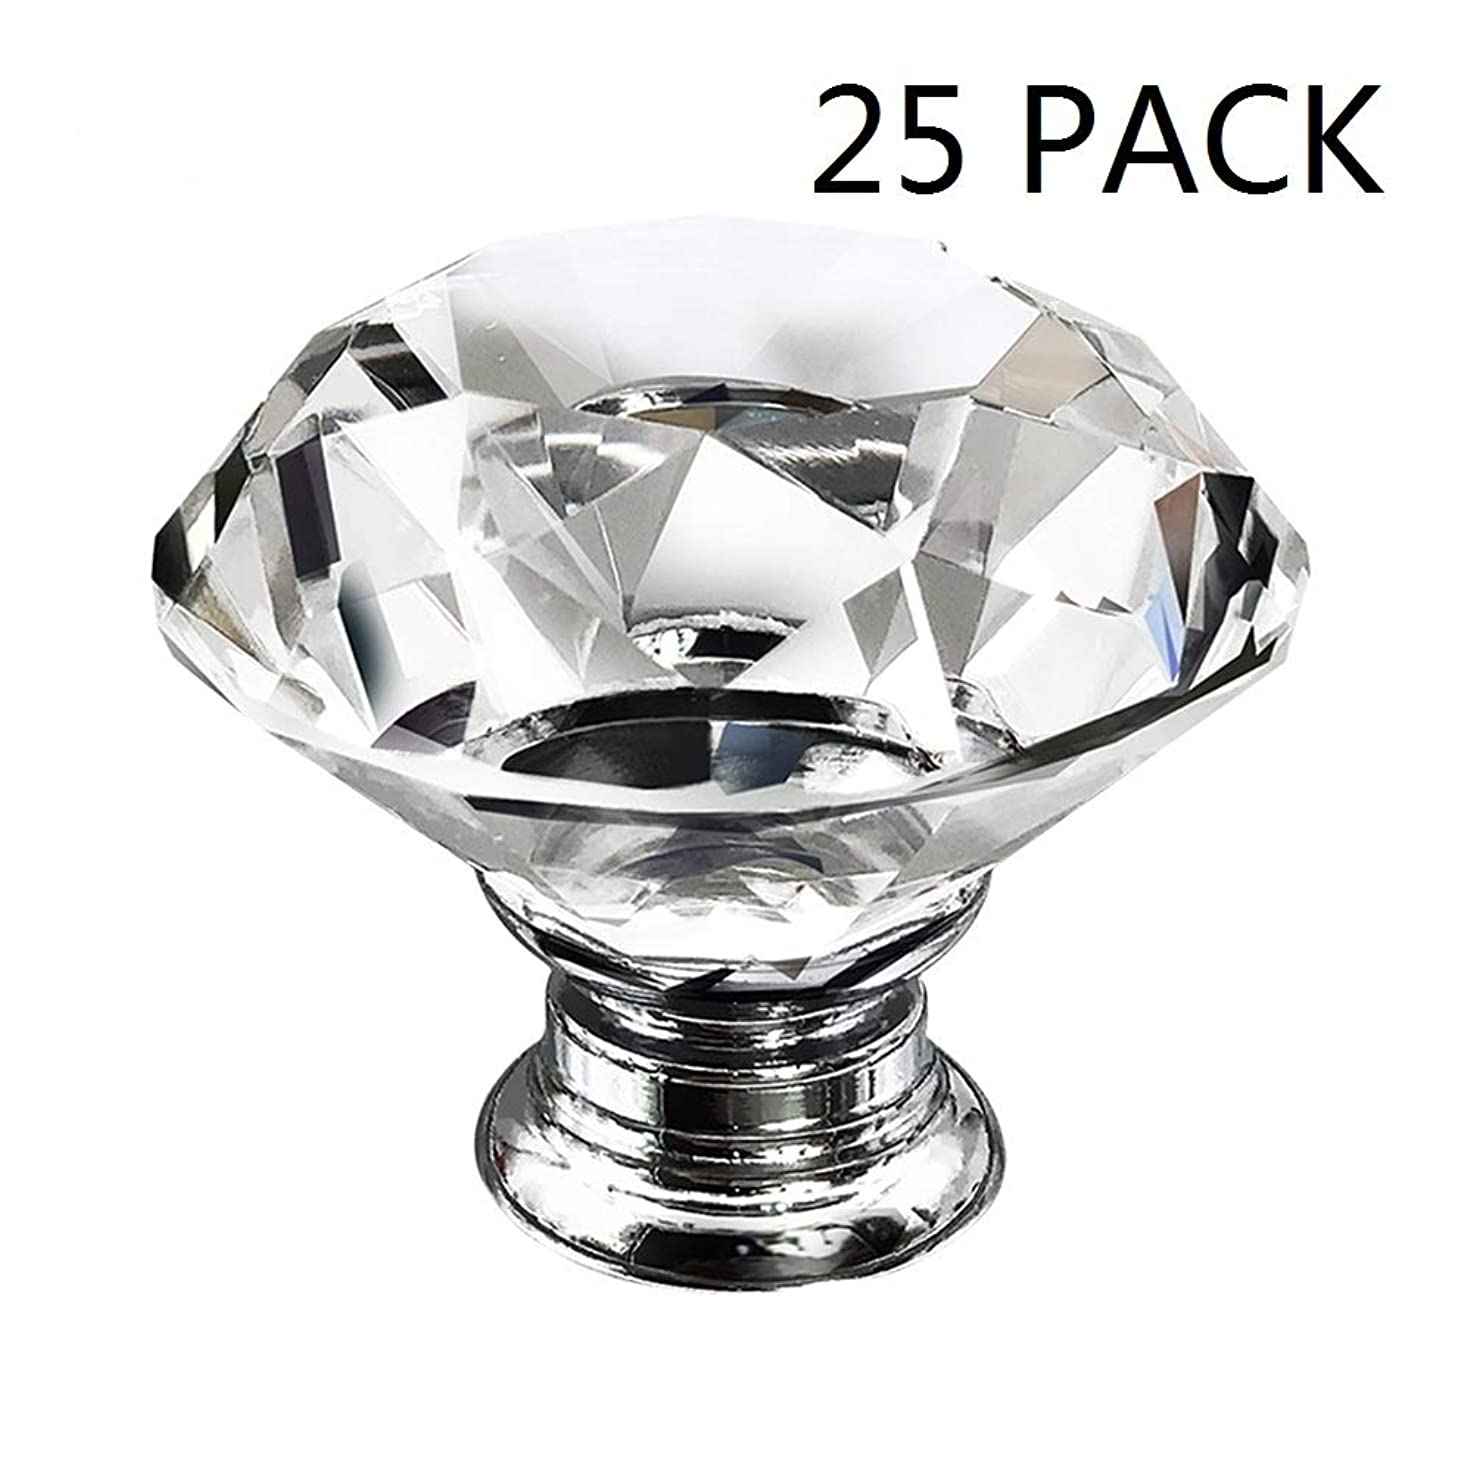 Dresser Crystal Knobs - 30MM 25 PCS Glass Crystal Drawer Knobs Pulls Cabinet Handle for Home Kitchen Wardrobe Cupboard kcxoeunfvalcm1